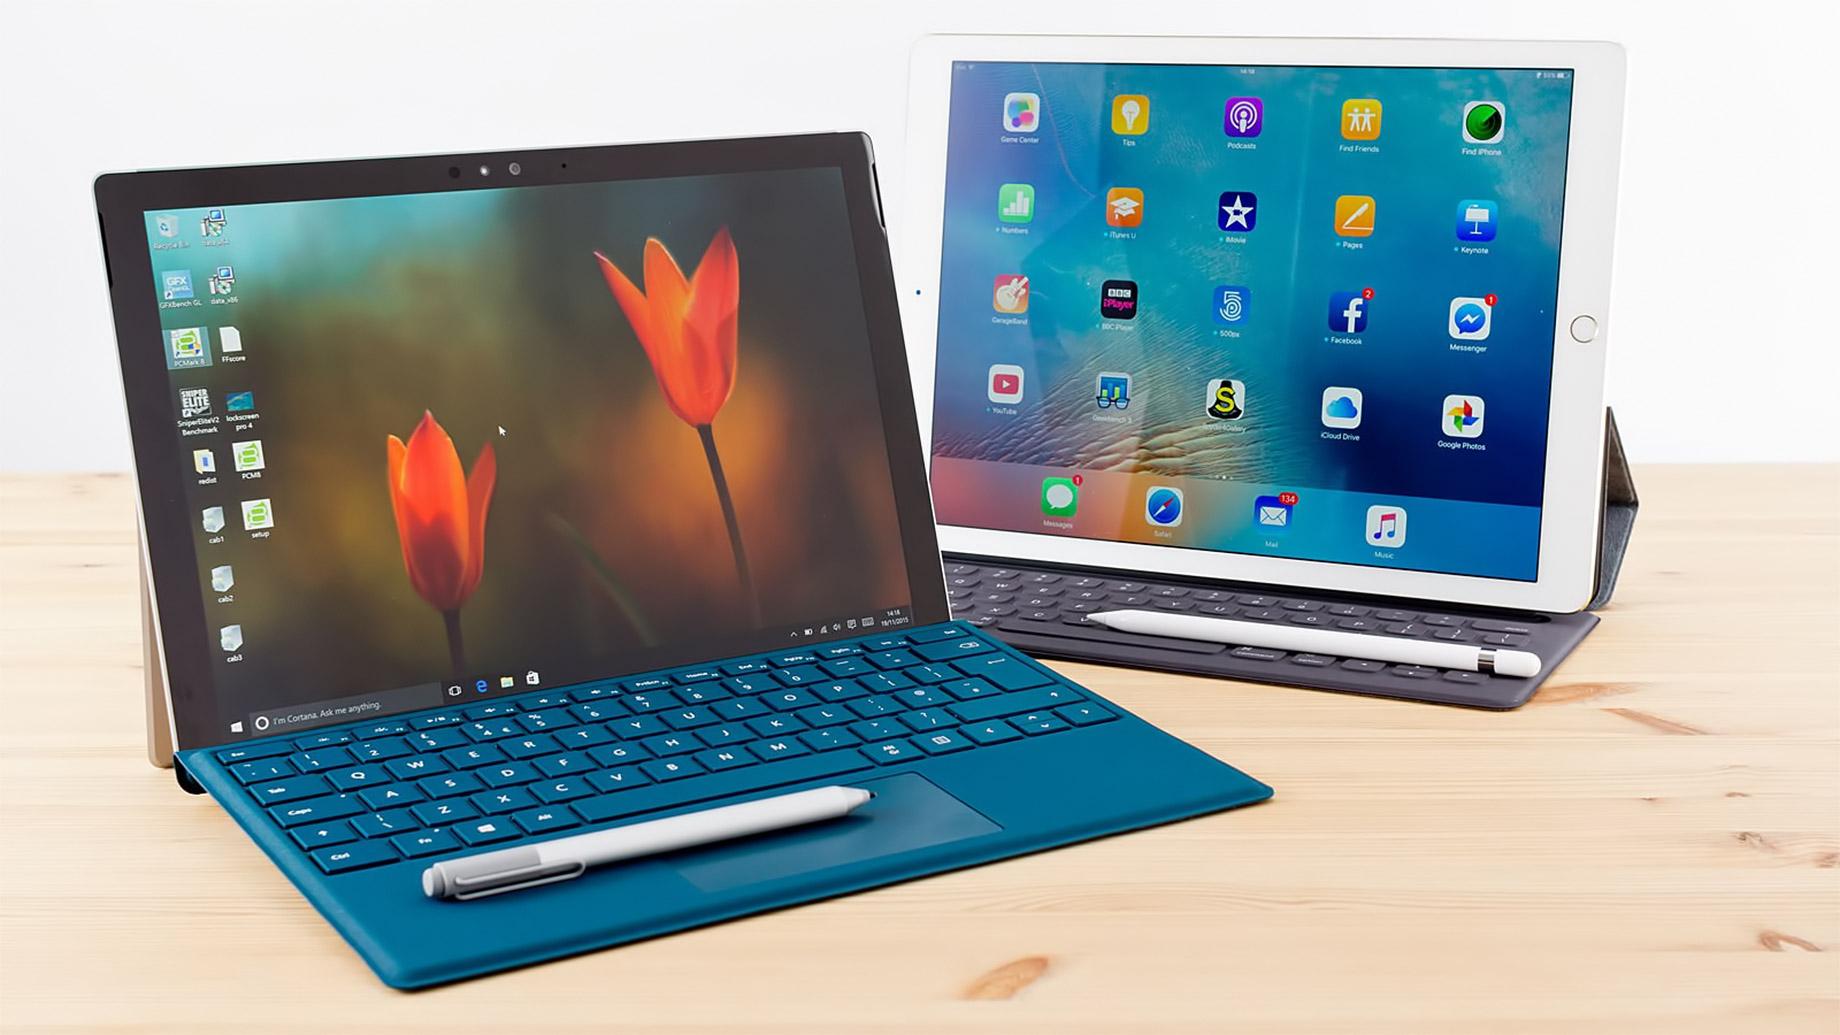 Global Wanderlust - High Tech Travel Gadgets for the World Explorer - Microsoft Surface Pro 4 - iPad Pro